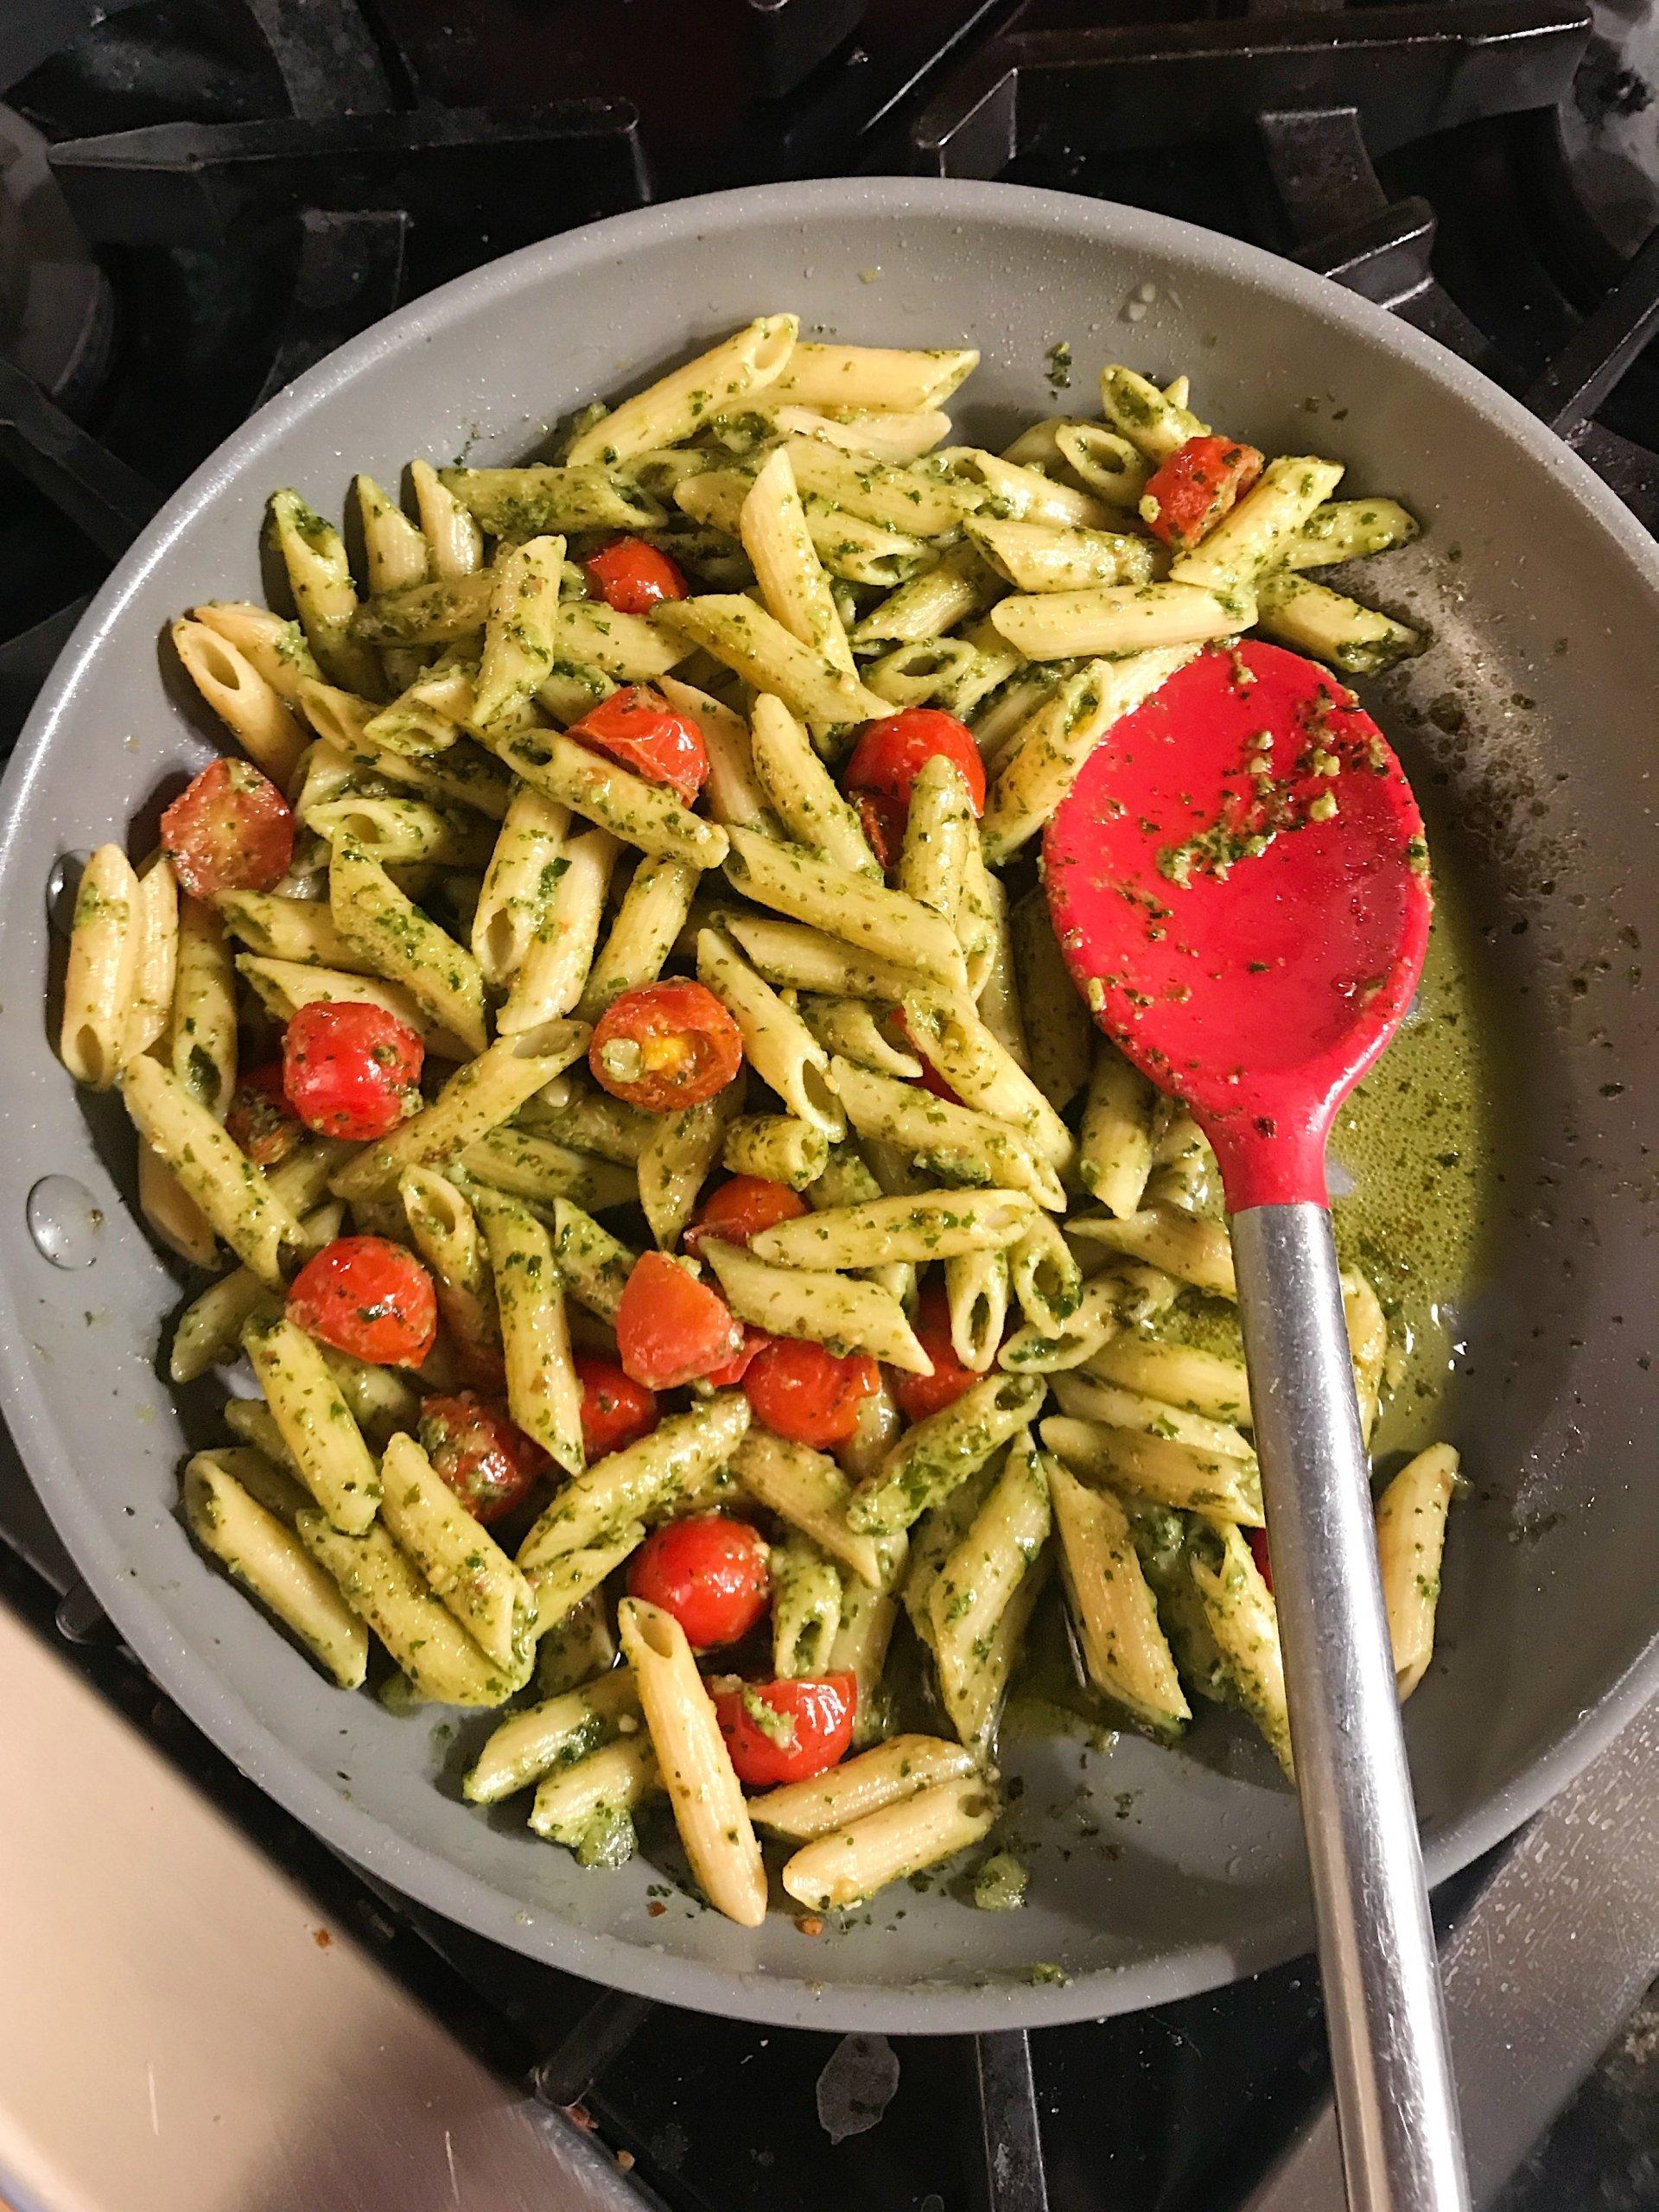 pesto penne gluten free most made recipes #glutenfreerecipes www.healthygffamily.com